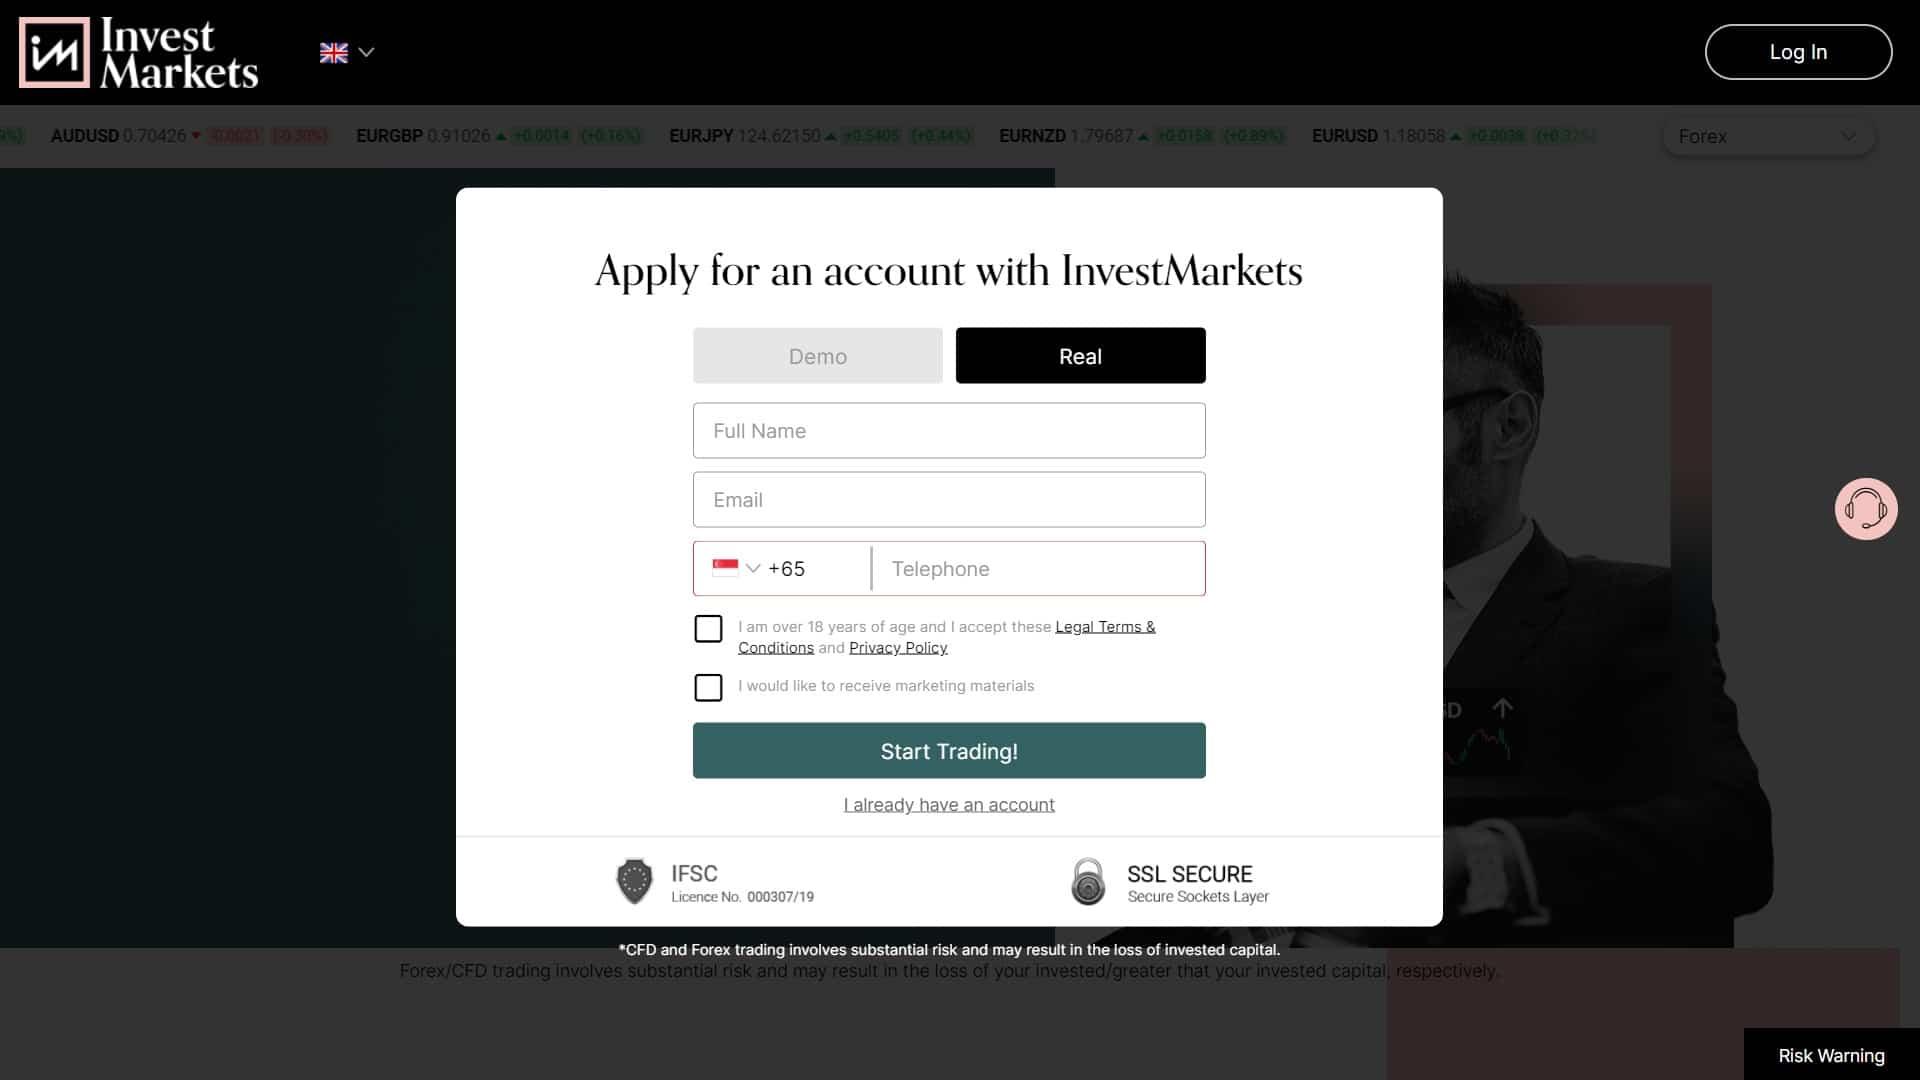 InvestMarkets registration page